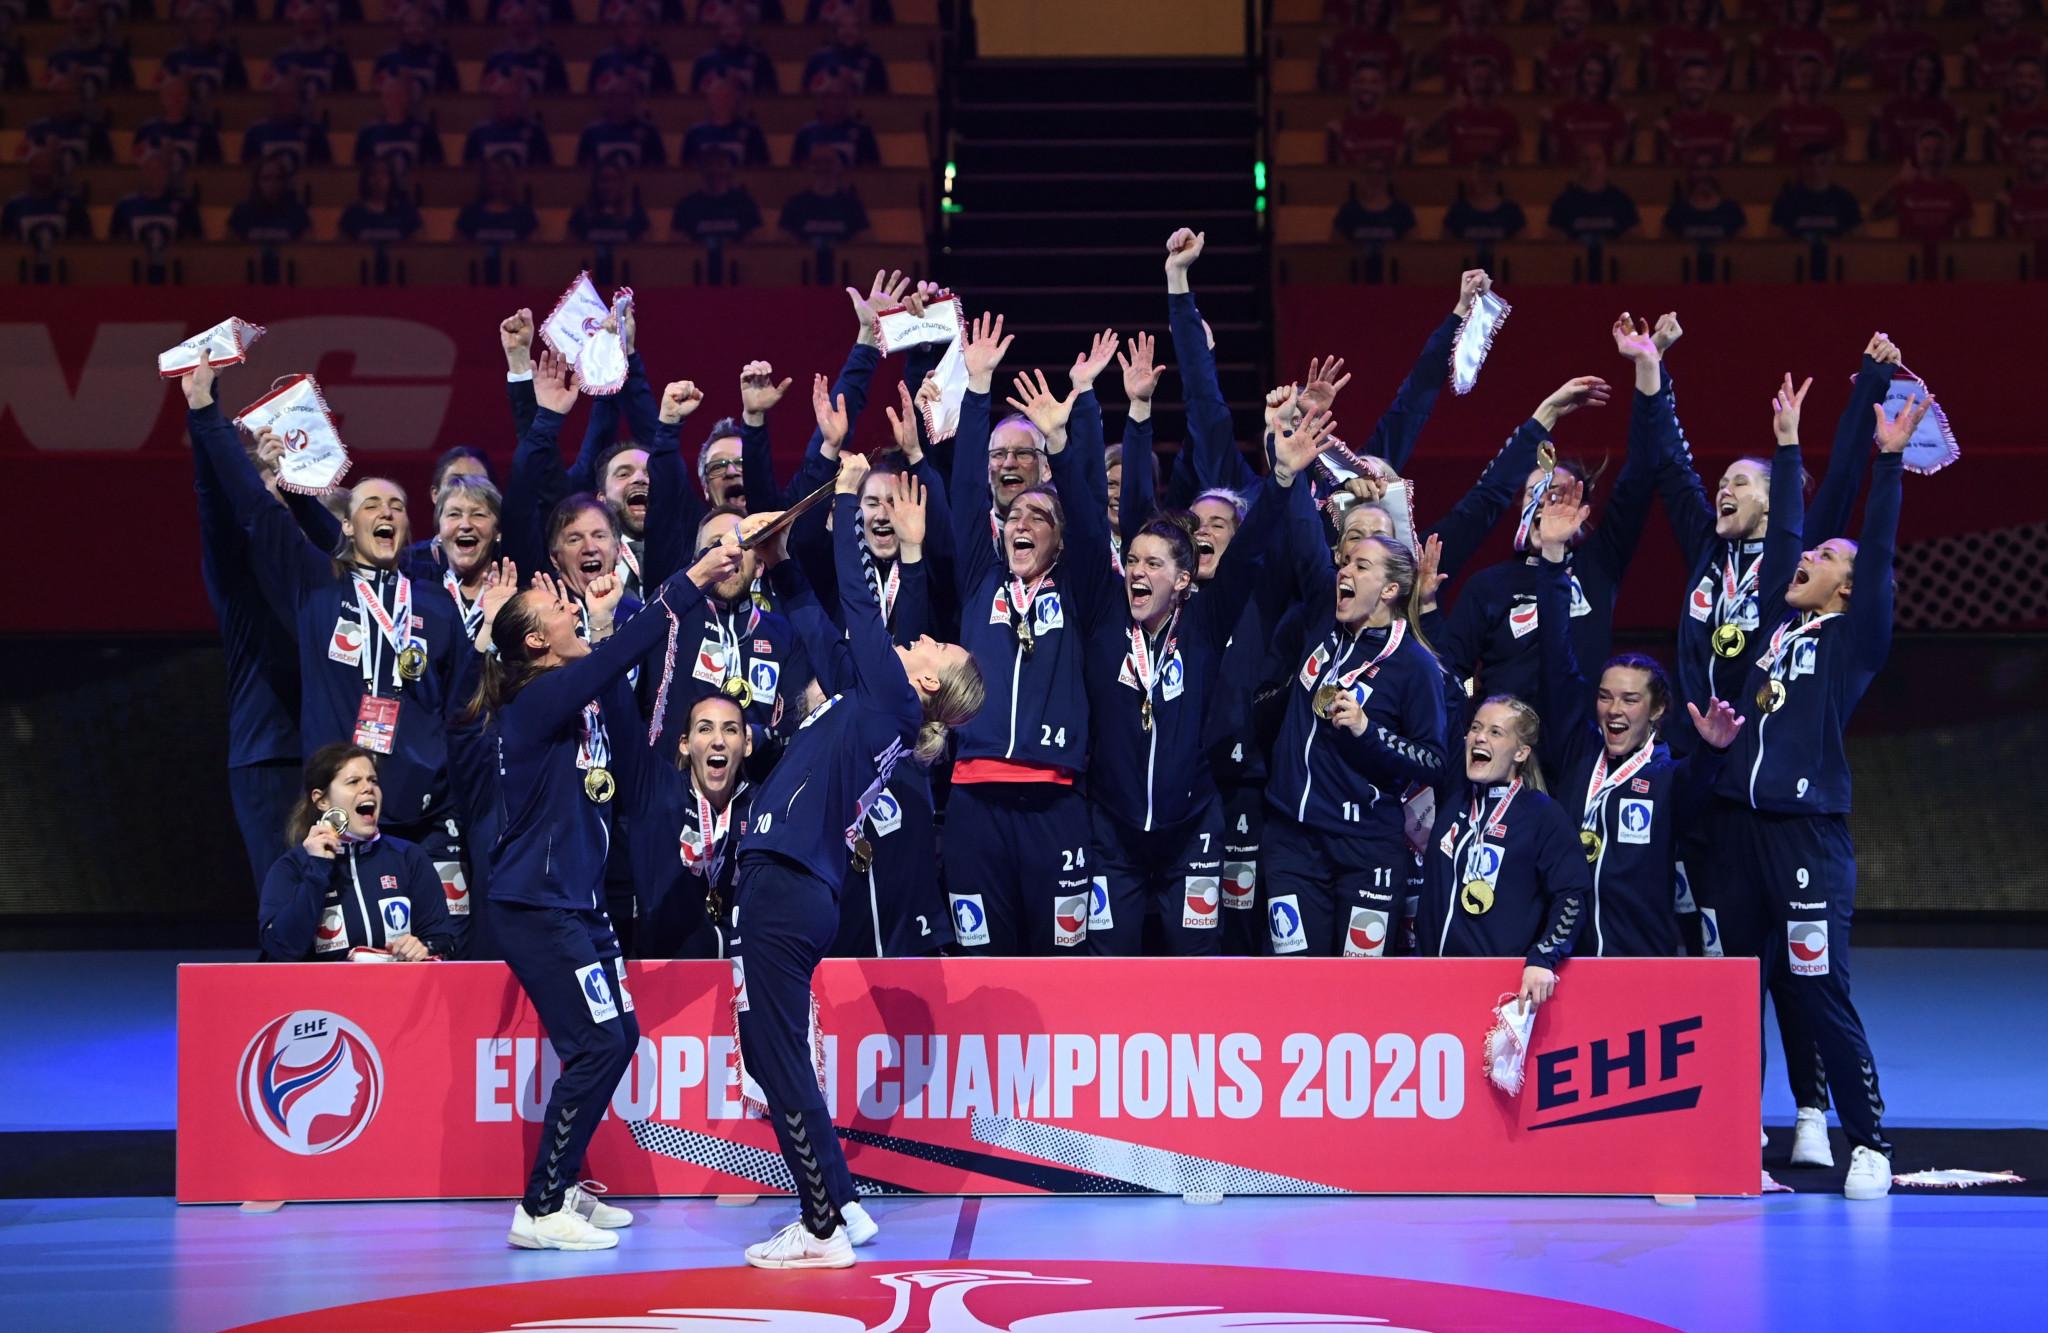 Norway edge defending champions France to win European Women's Handball Championship